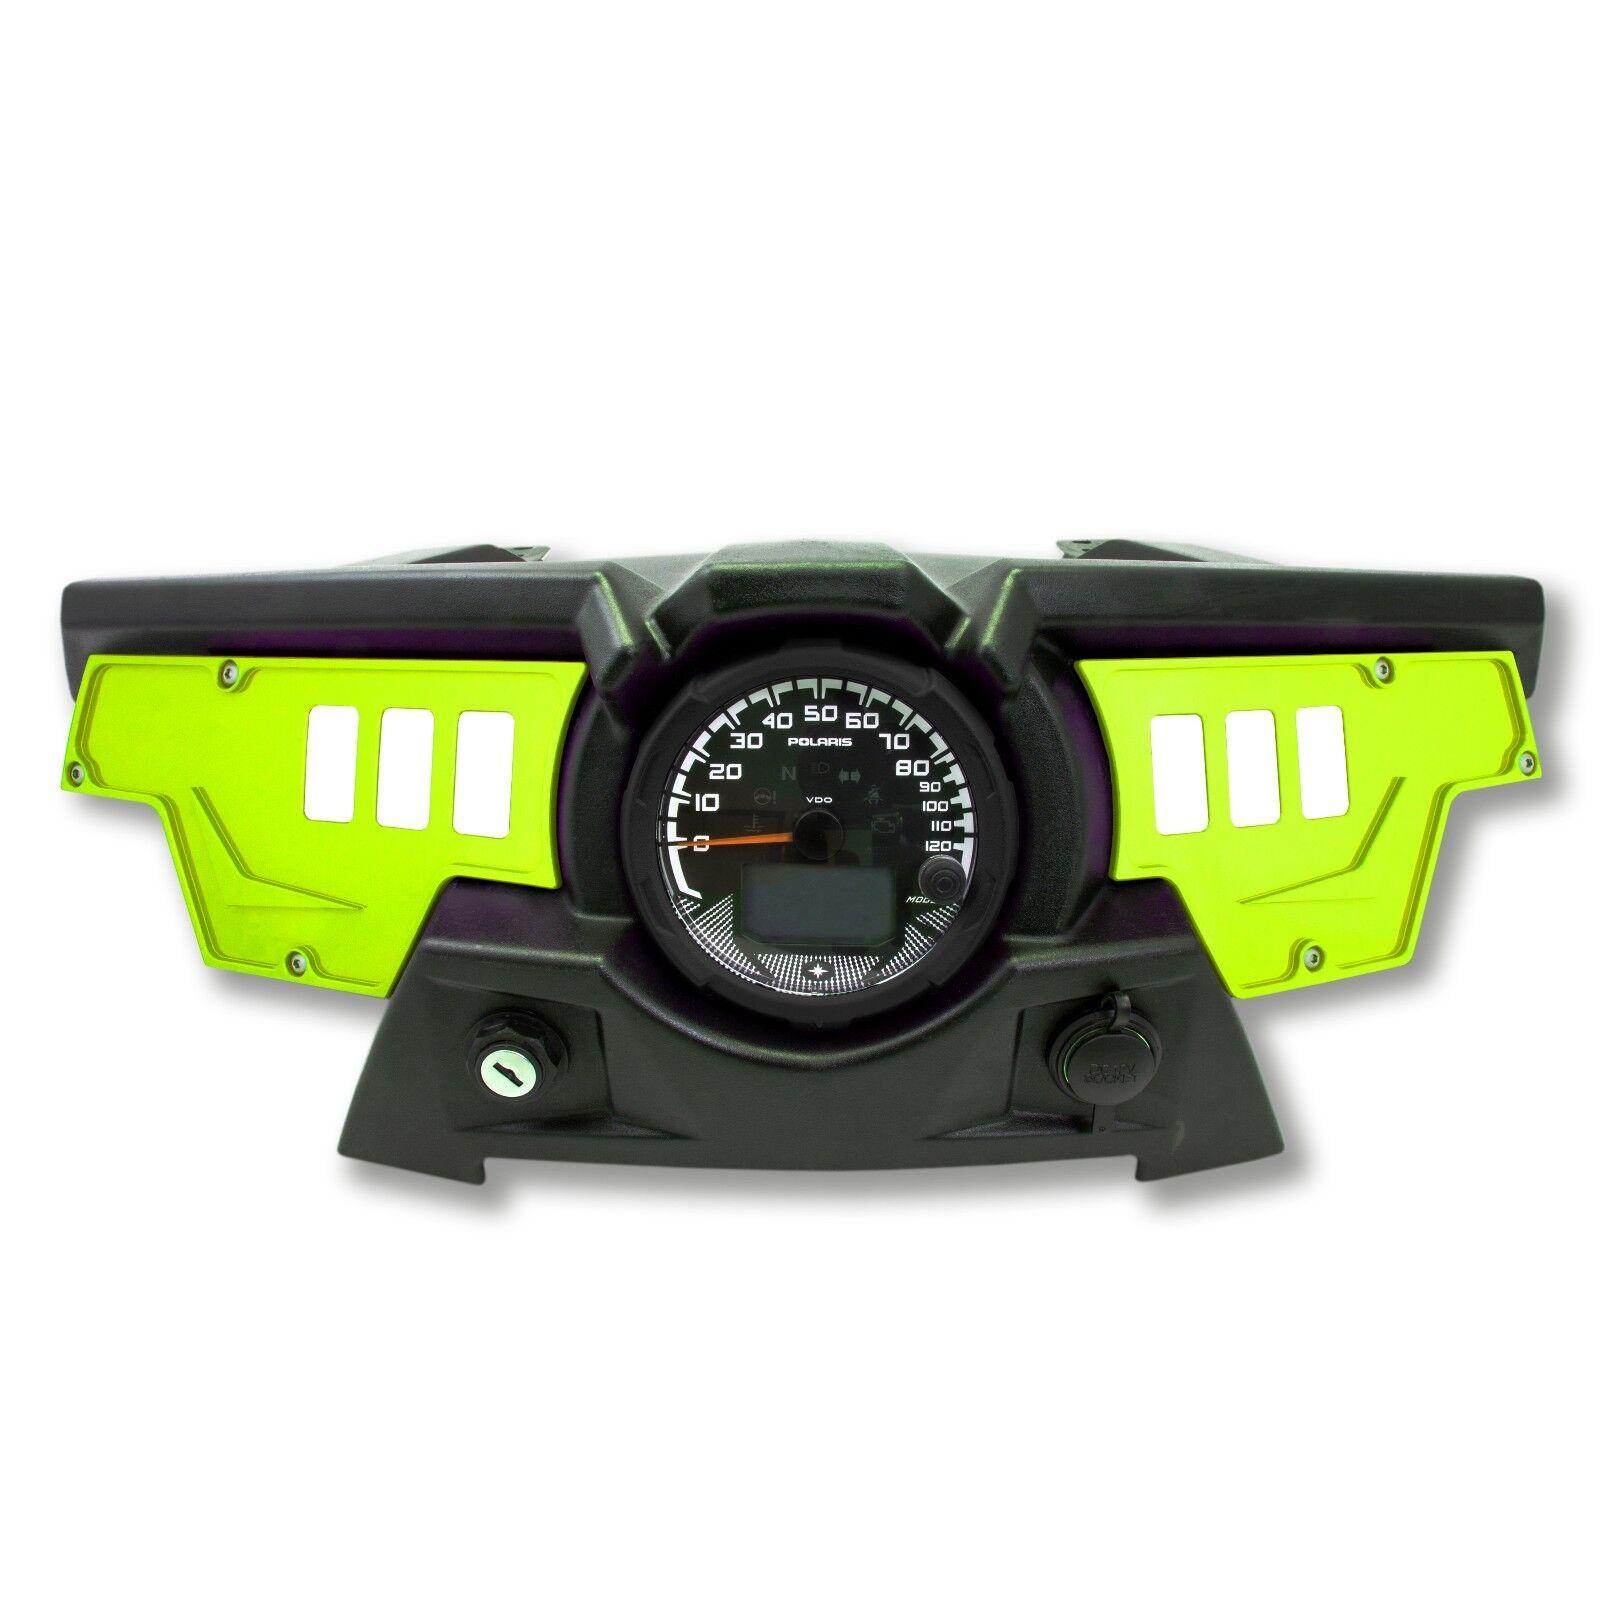 6 Switch Dash Panel Plates Custom for Polaris RZR XP1000 Lime